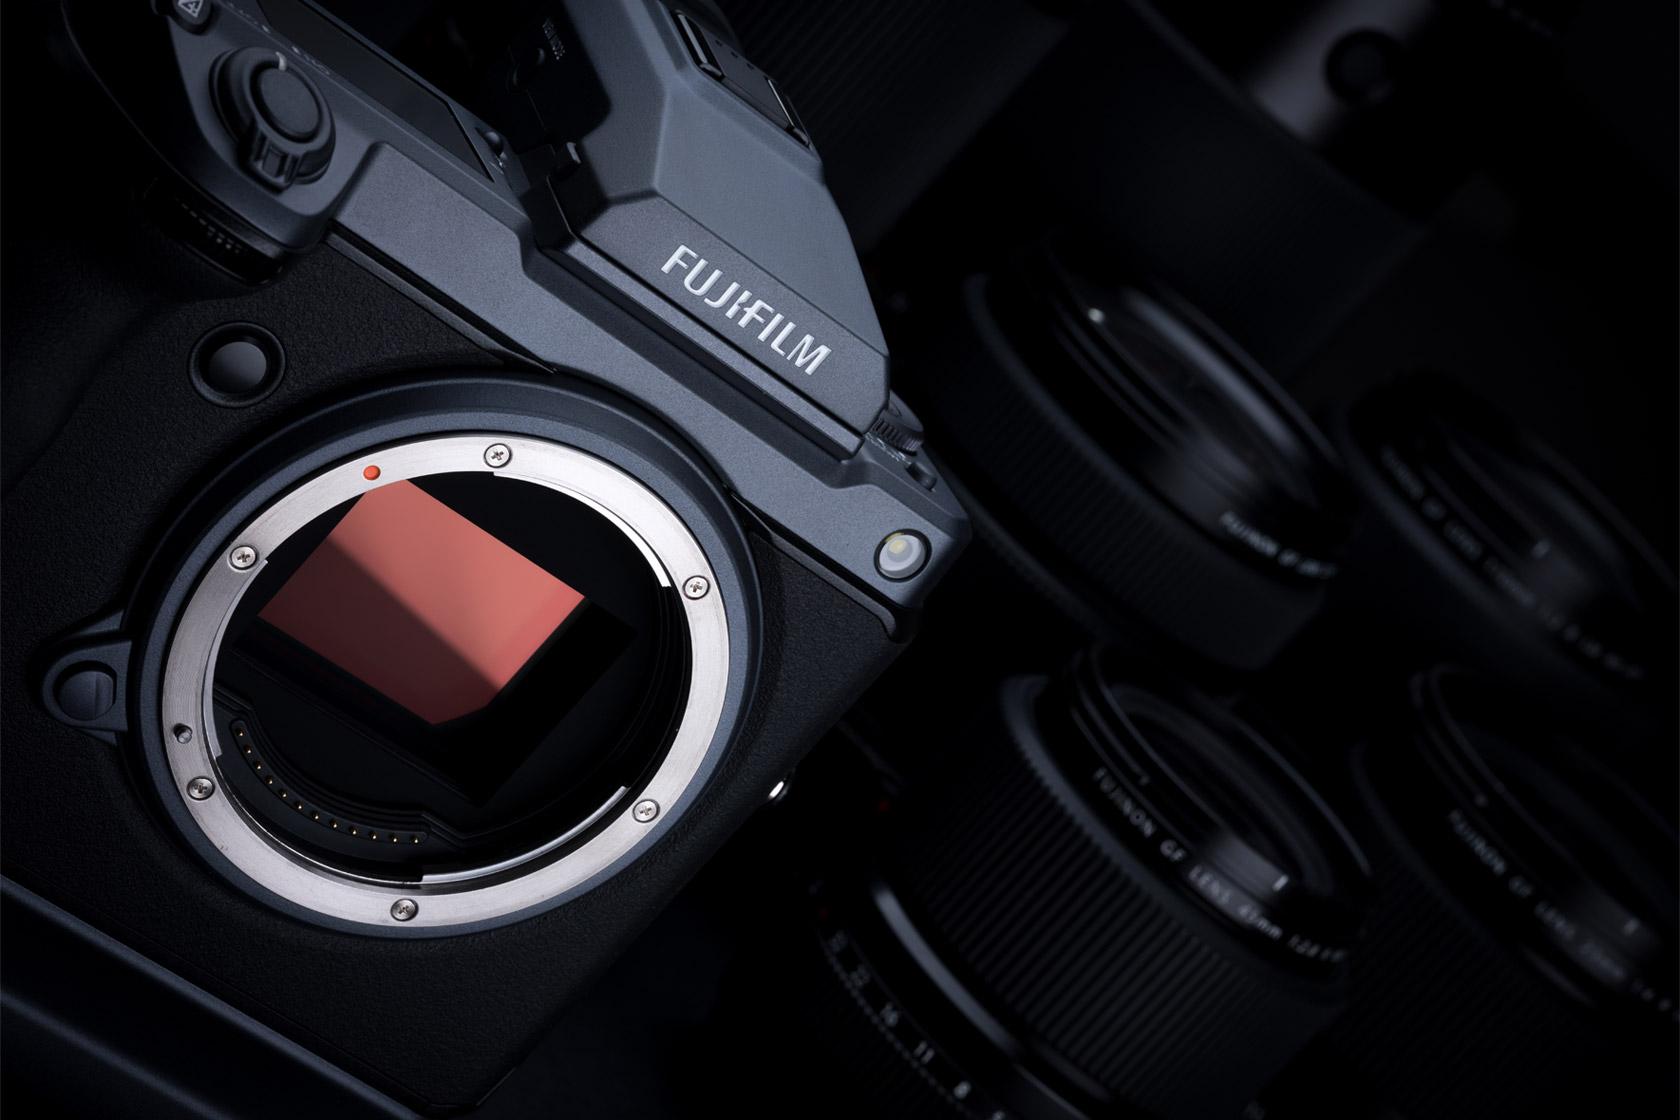 [ph[photo] Fujifilm GFX System digital camera body only next to assorted lenses